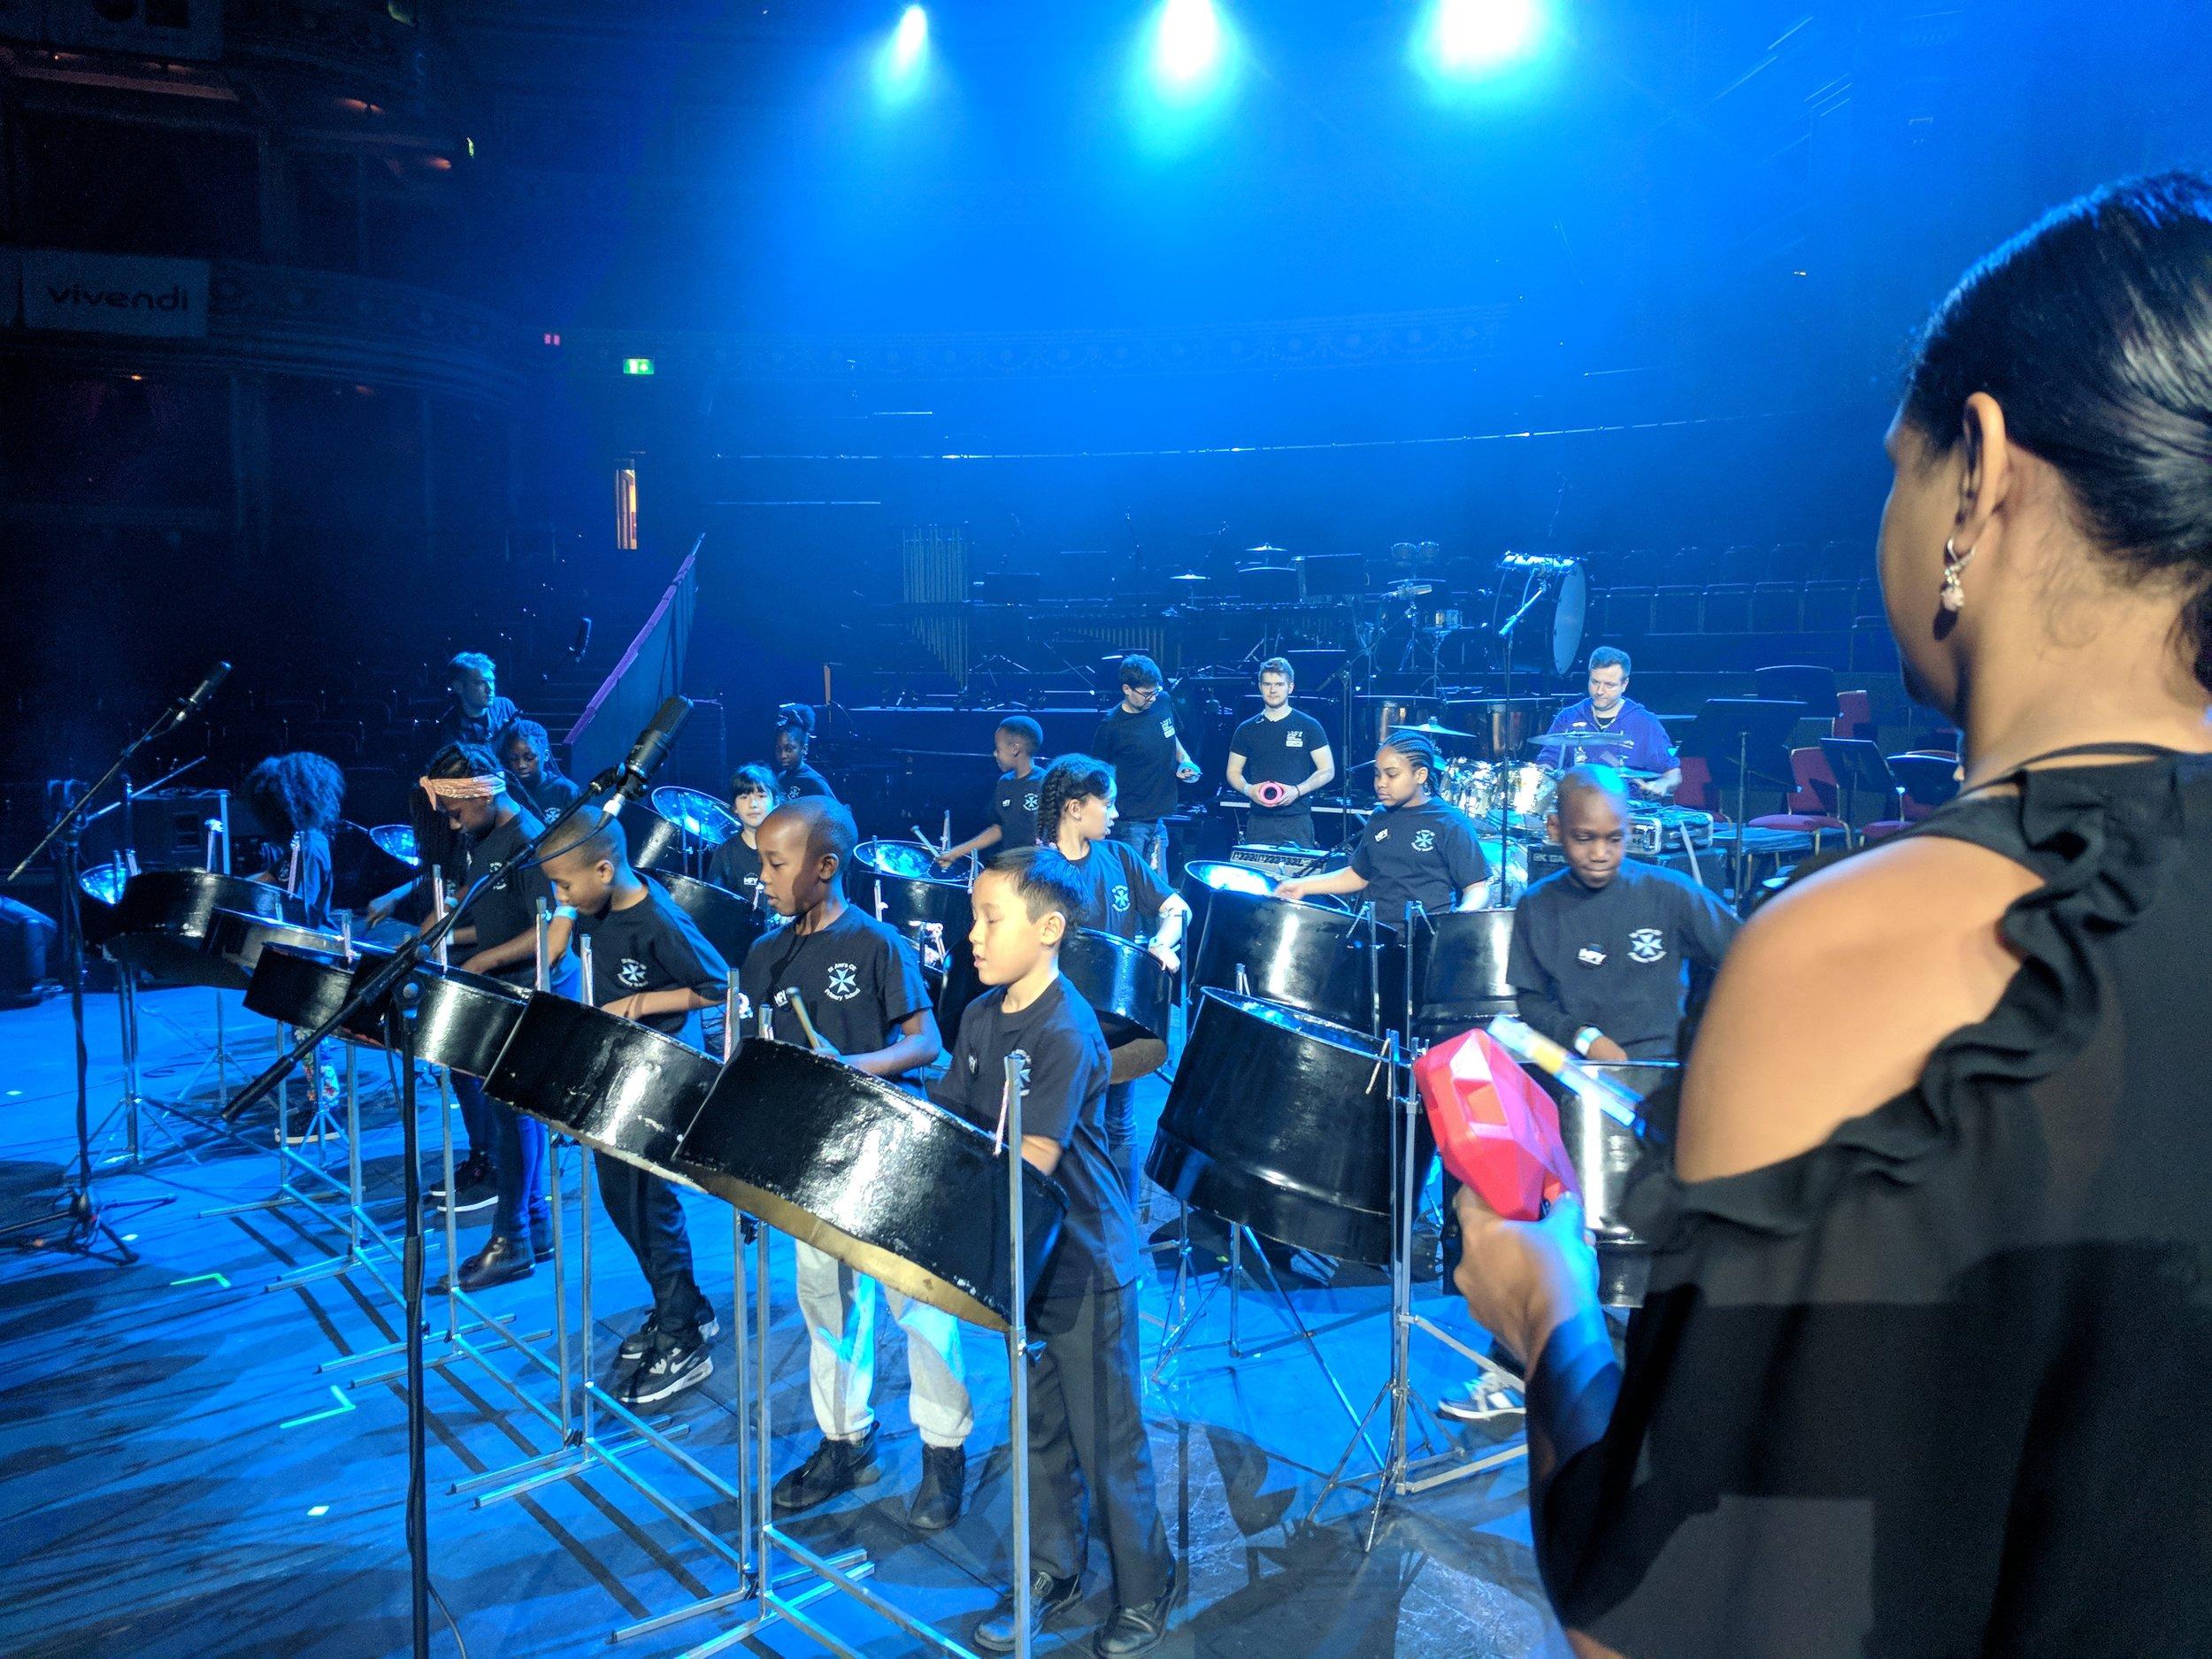 Alicia drilling the band.